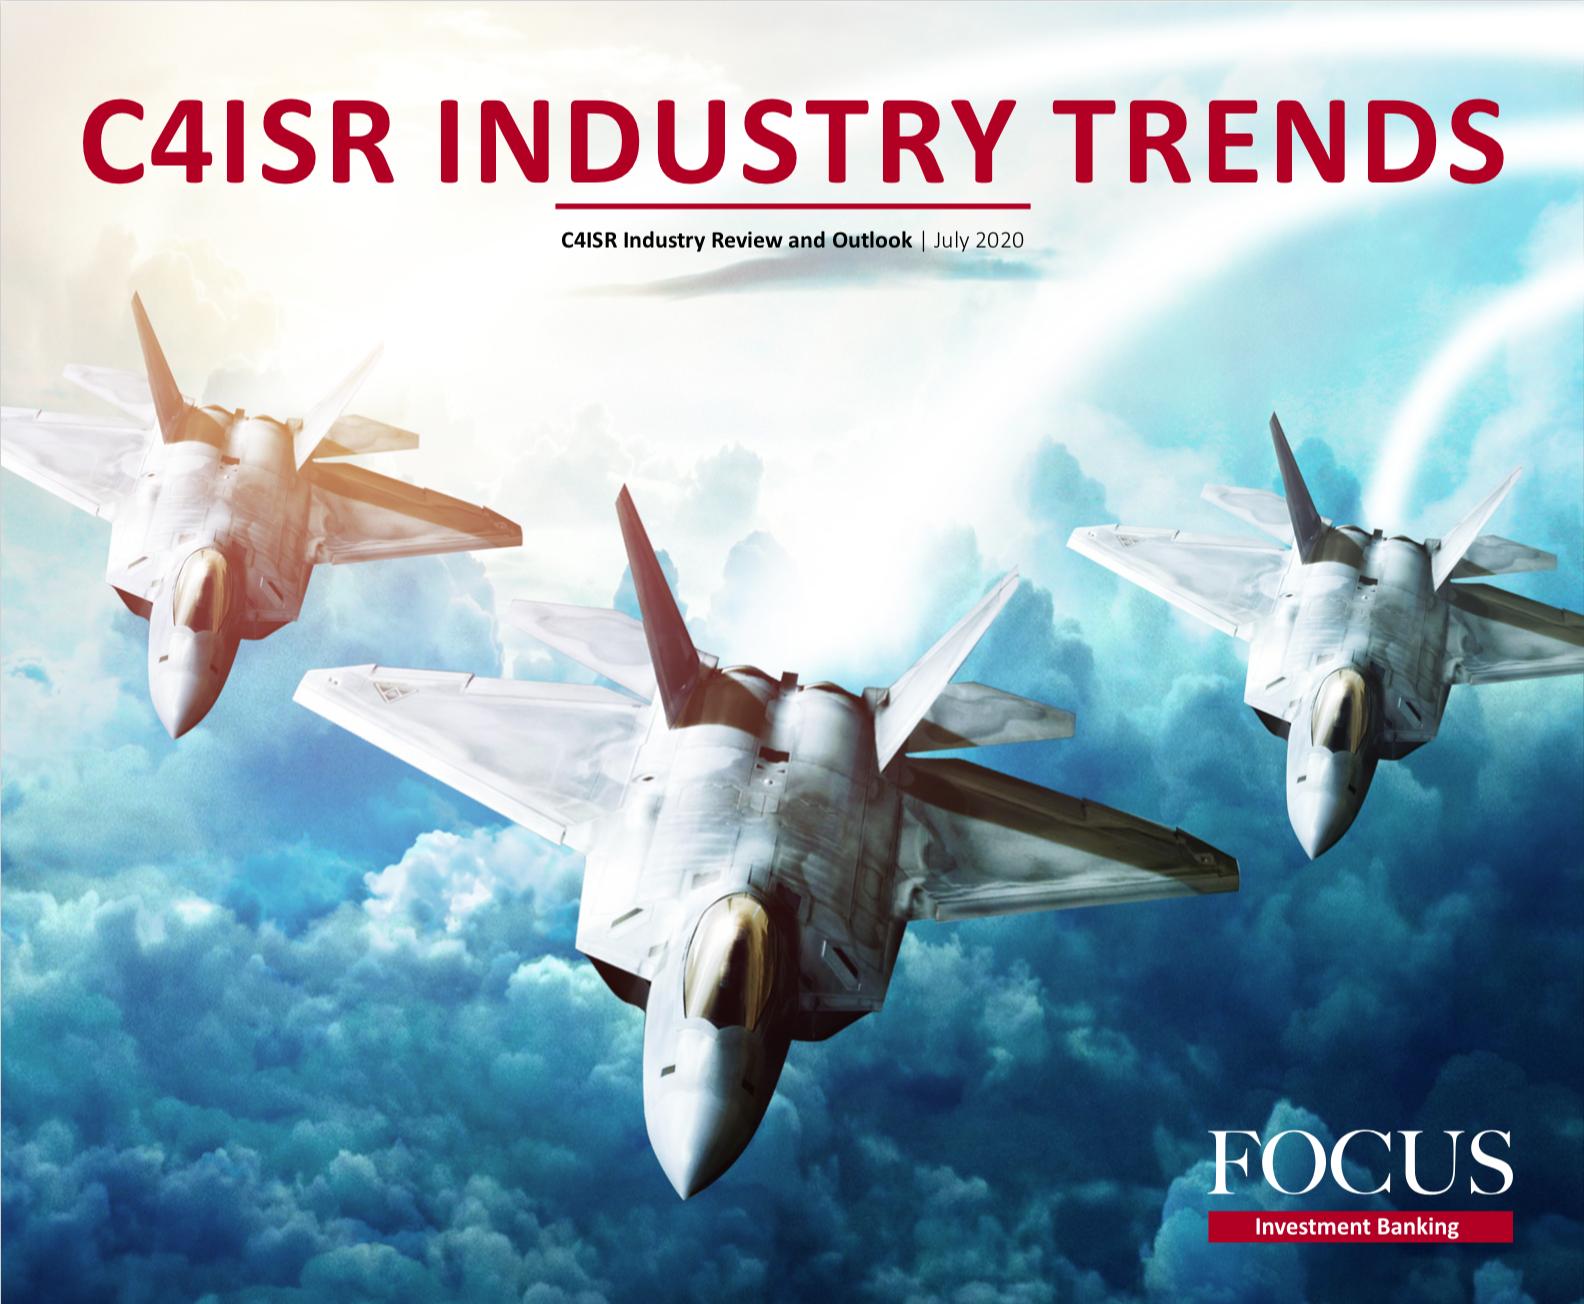 C4ISR Industry Trends - July 2020